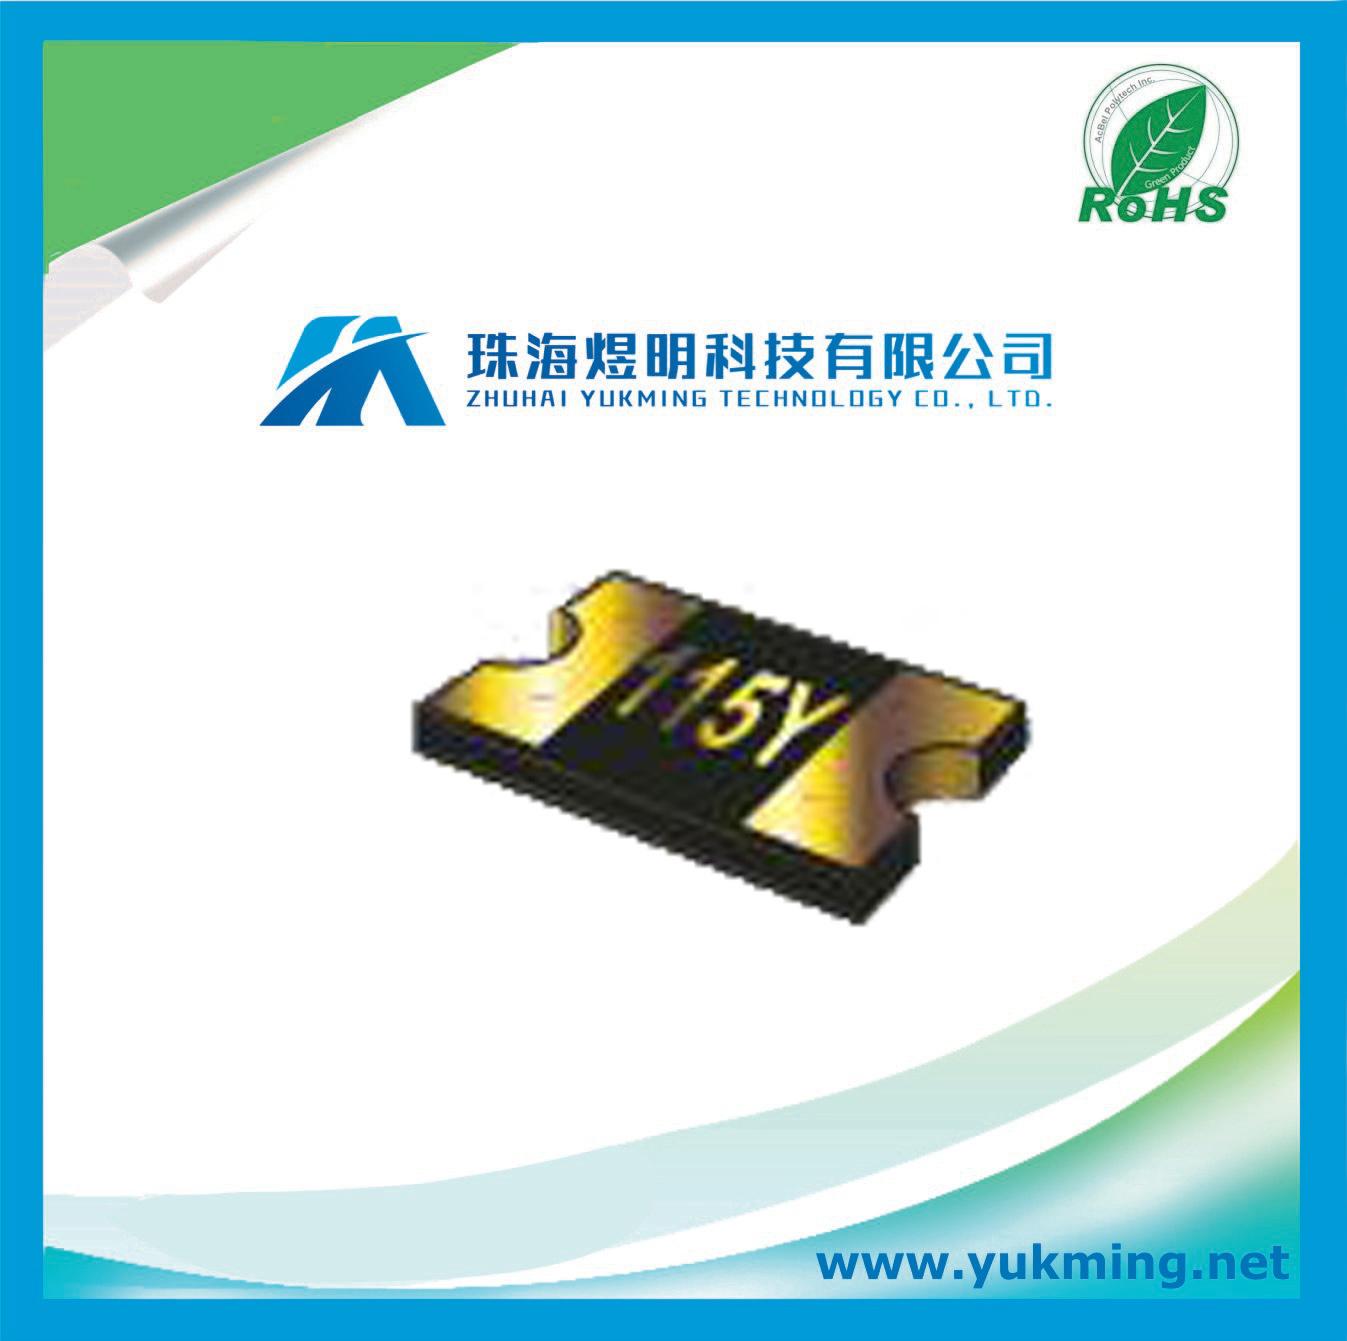 Fuse Mf-Msmf050-2 Mf-Msmf Series PTC Resettable